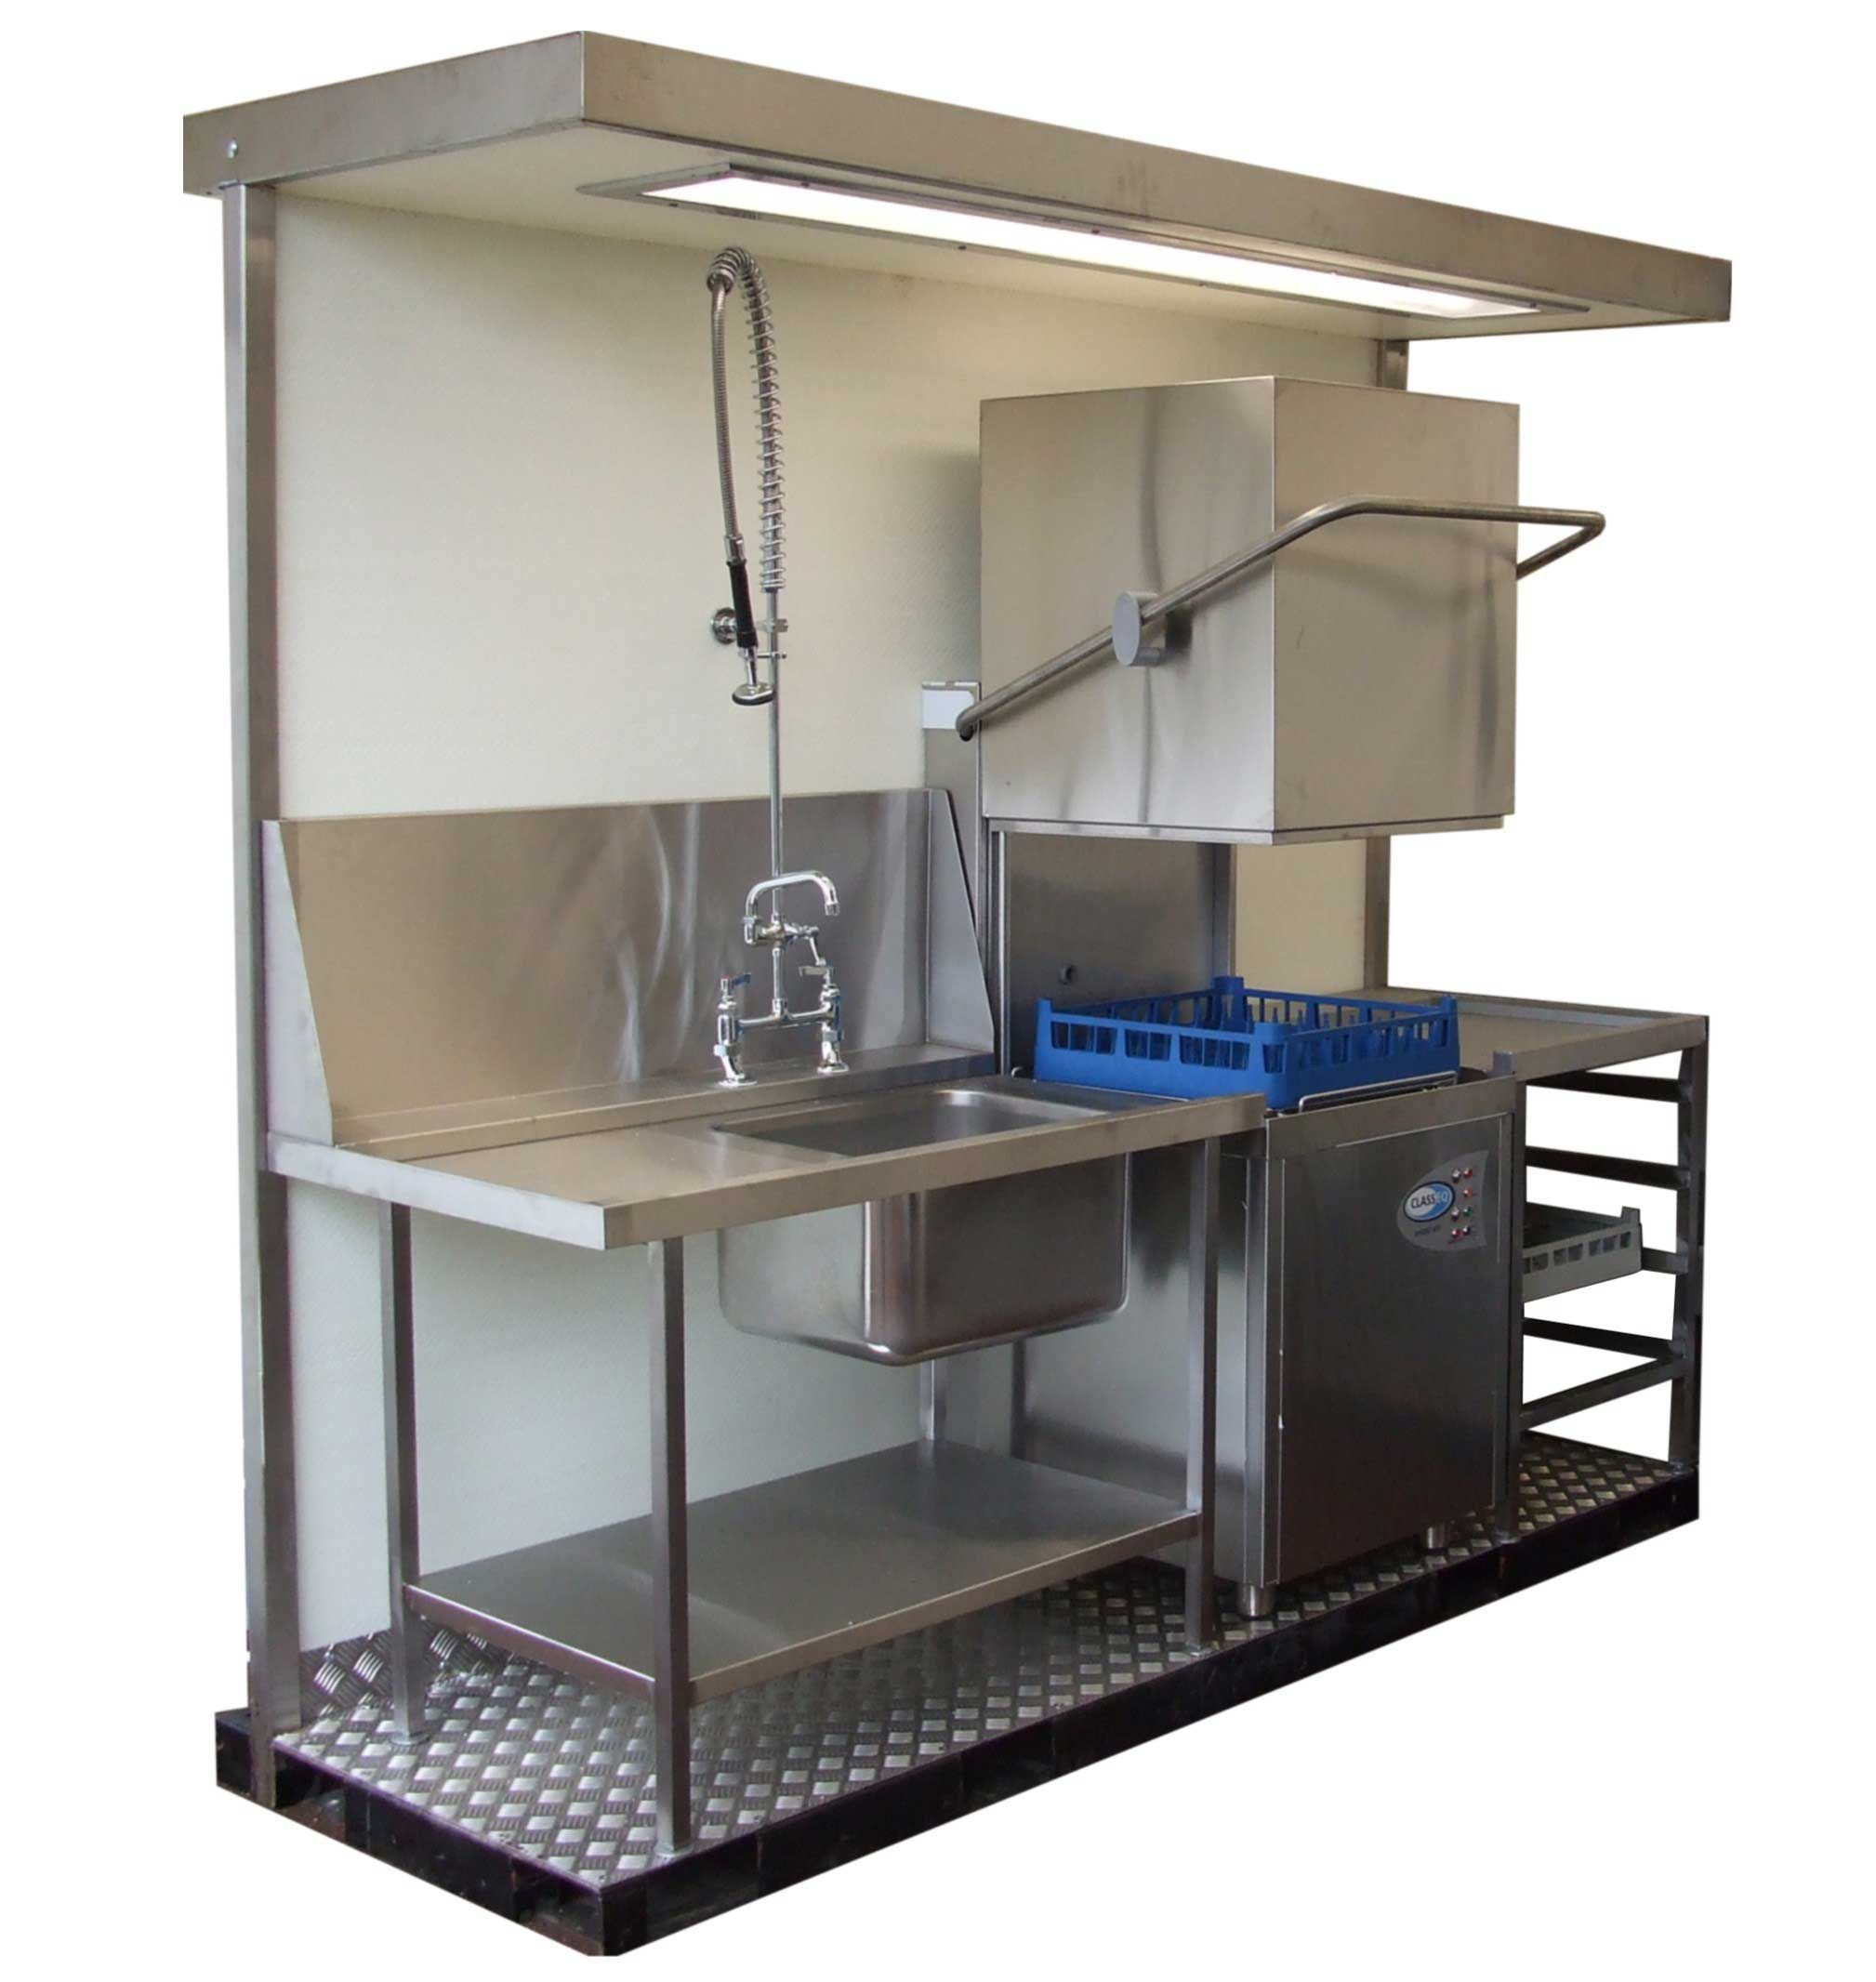 Commercial Dishwashing Layout Google Search Restaurant Kitchen